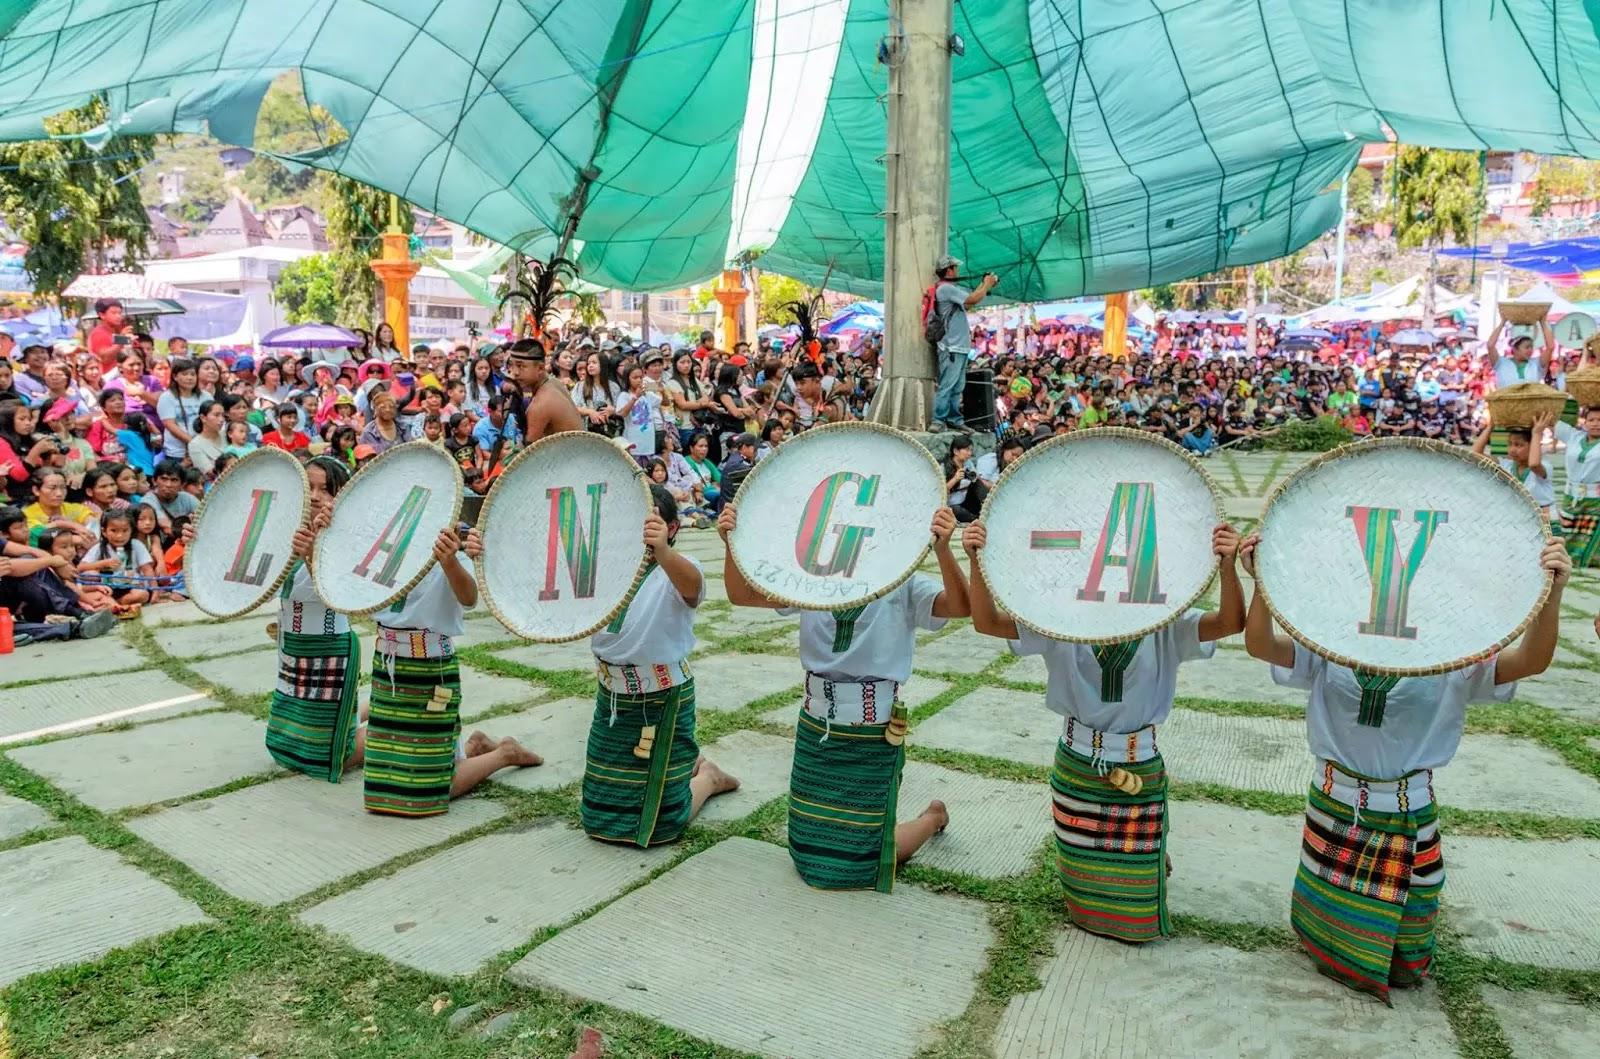 LANG-AY Signage 13th Lang-Ay Festival Bontoc Mountain Province Cordillera Administrative Region Philippines